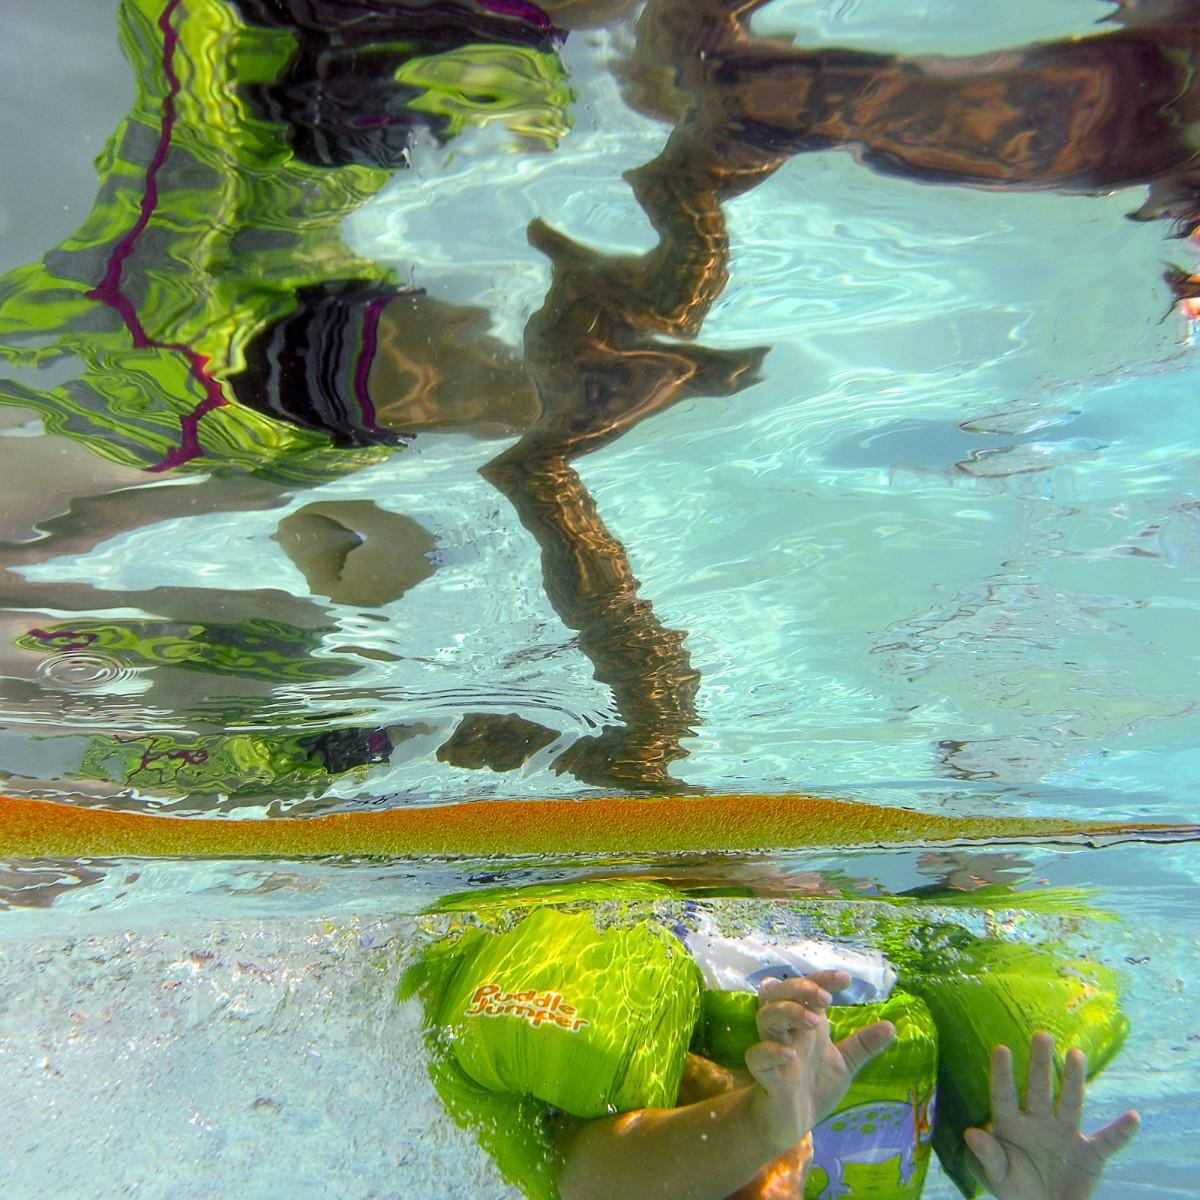 Seaspray by Alan Powell